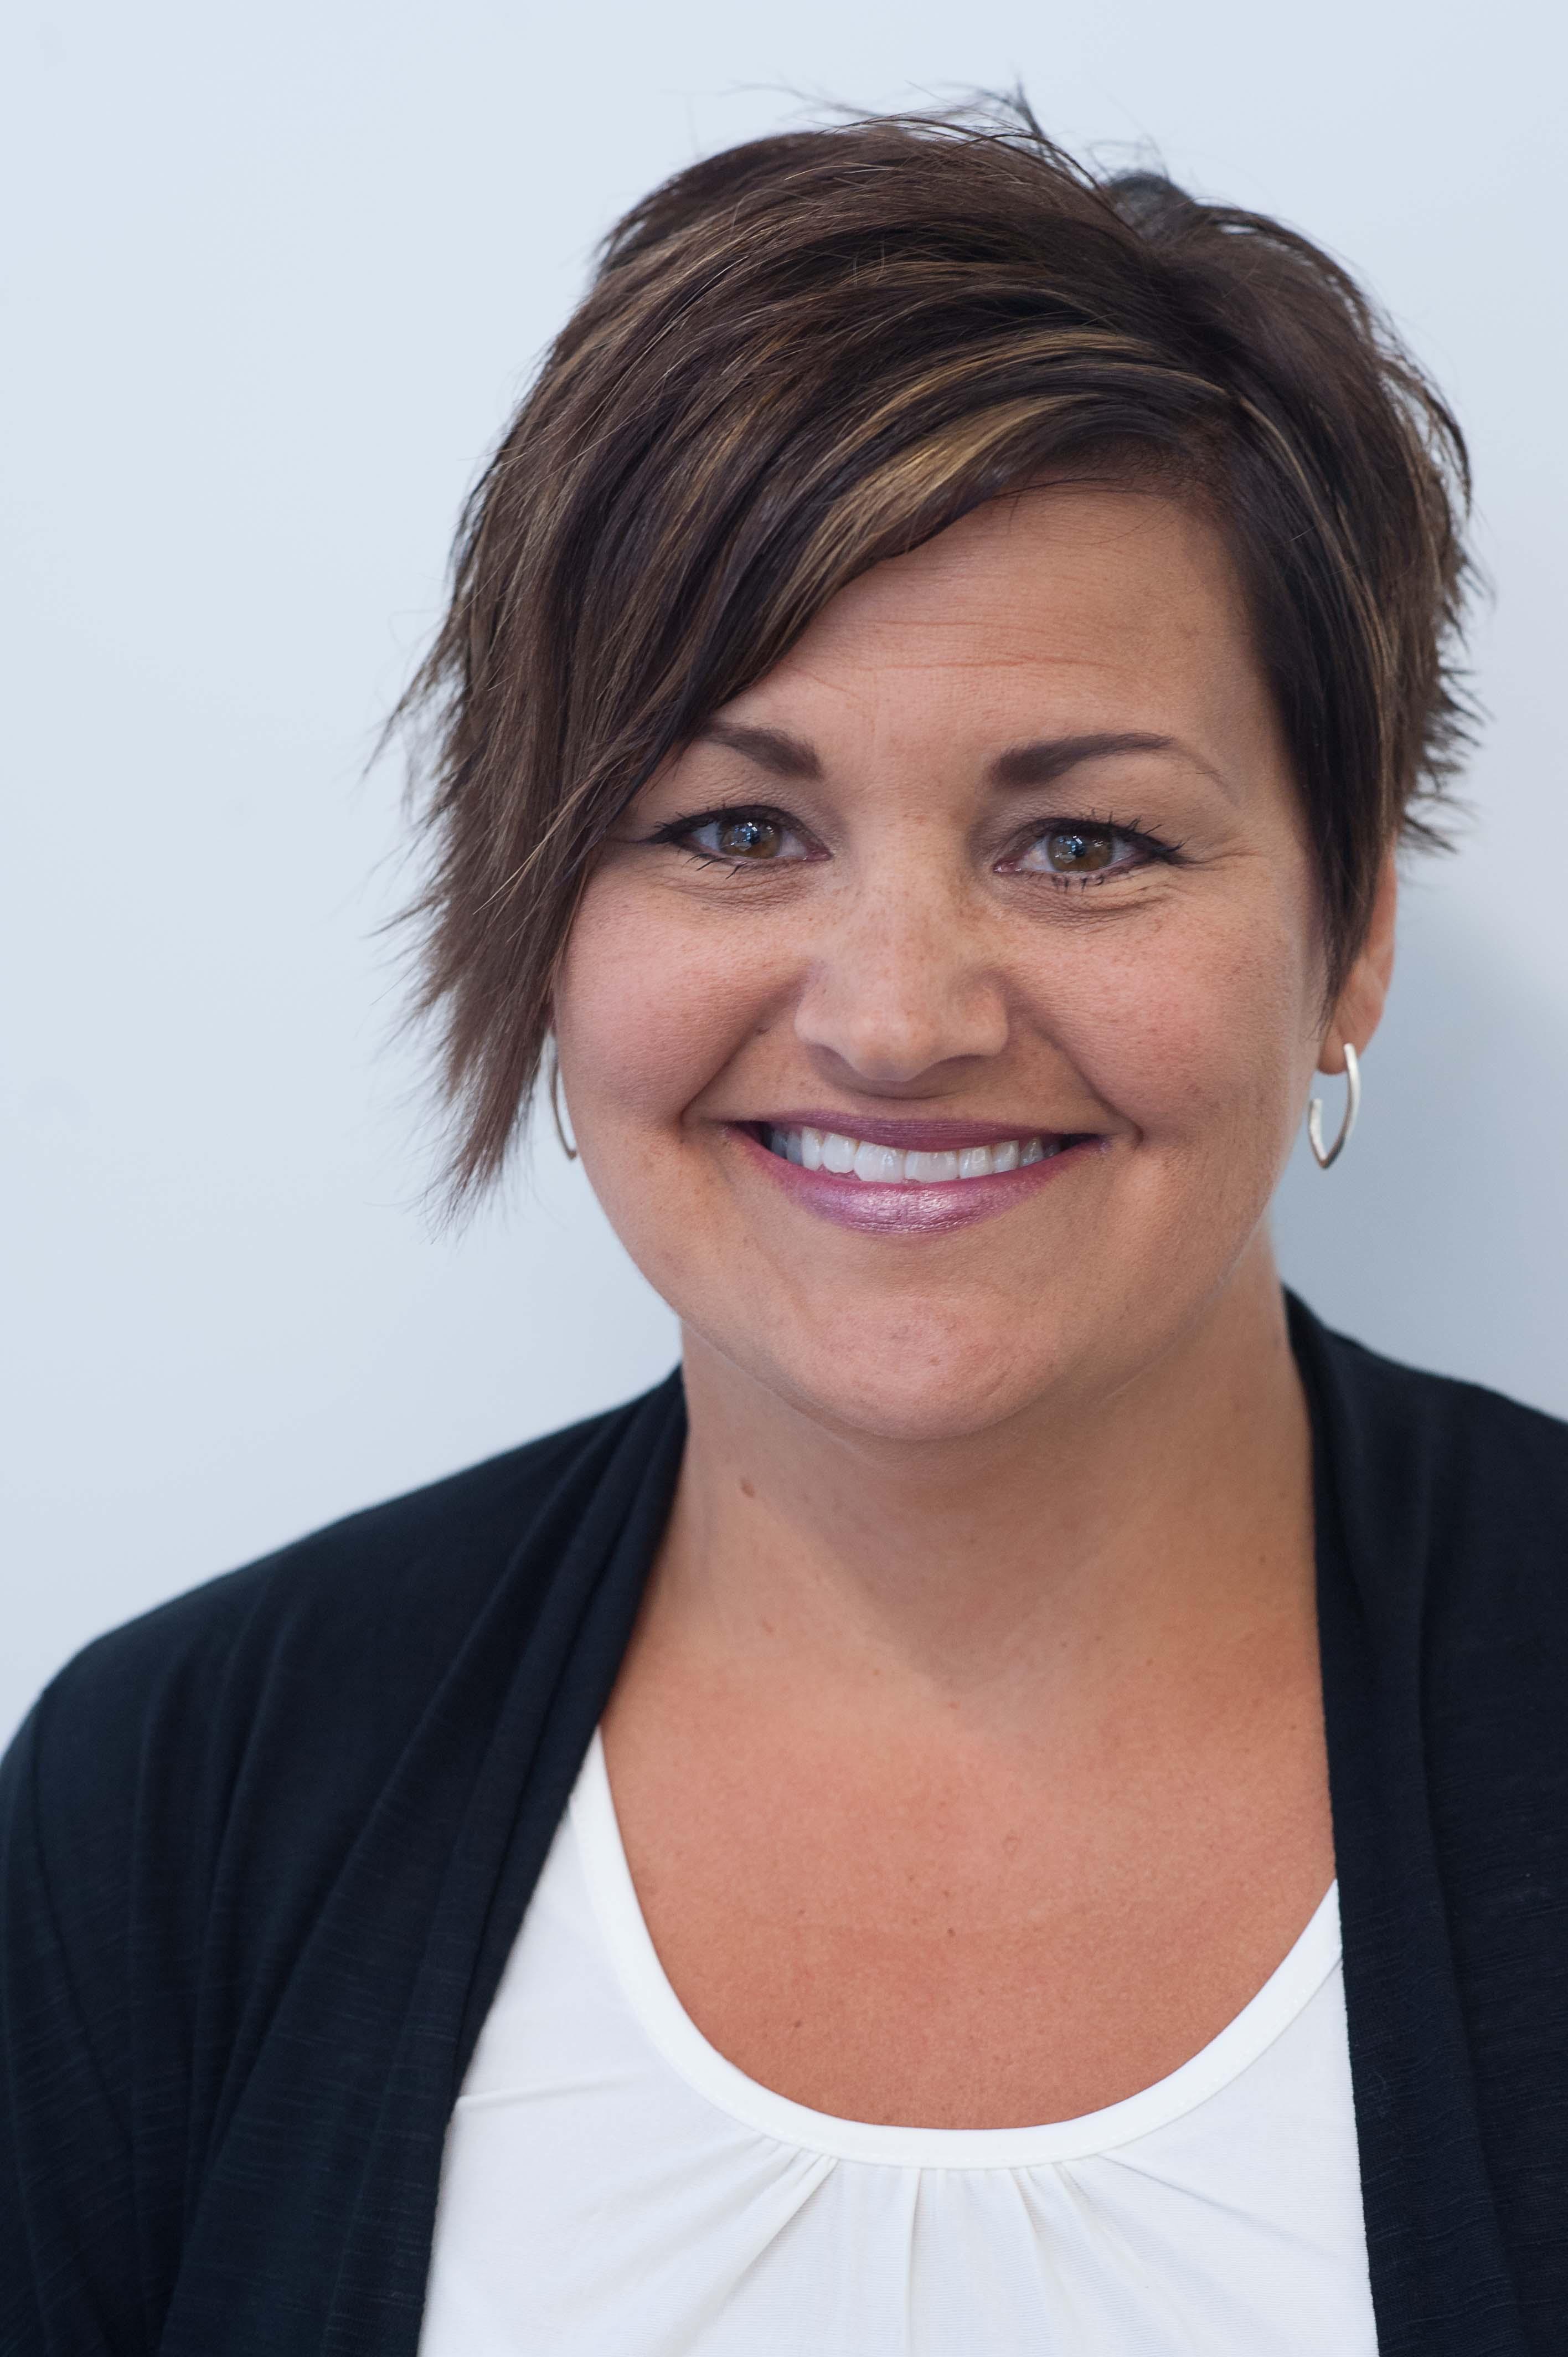 Melenie Olfert - Instructor